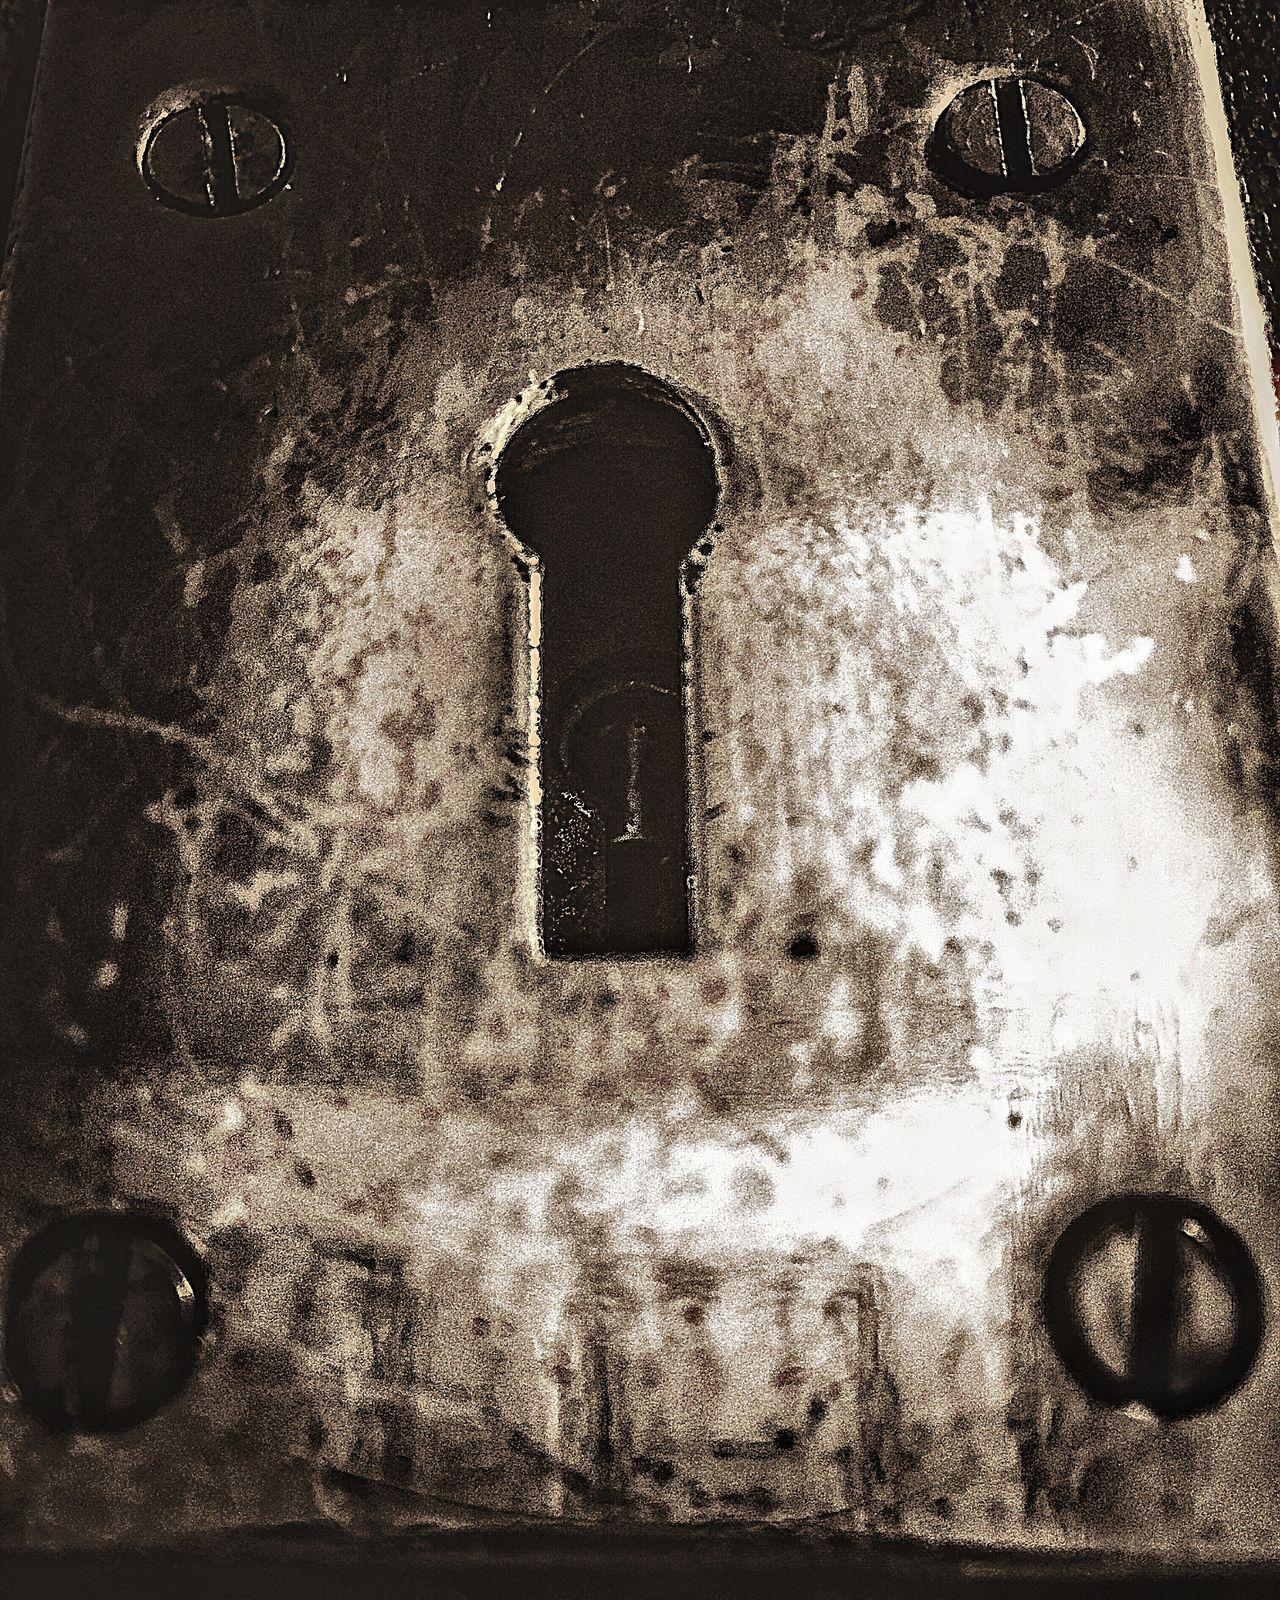 Keyhole The Week Of Eyeem Dark Artistic Creative Photography Weathered Showcase July Fine Art Urban Exploration Metallic Screws